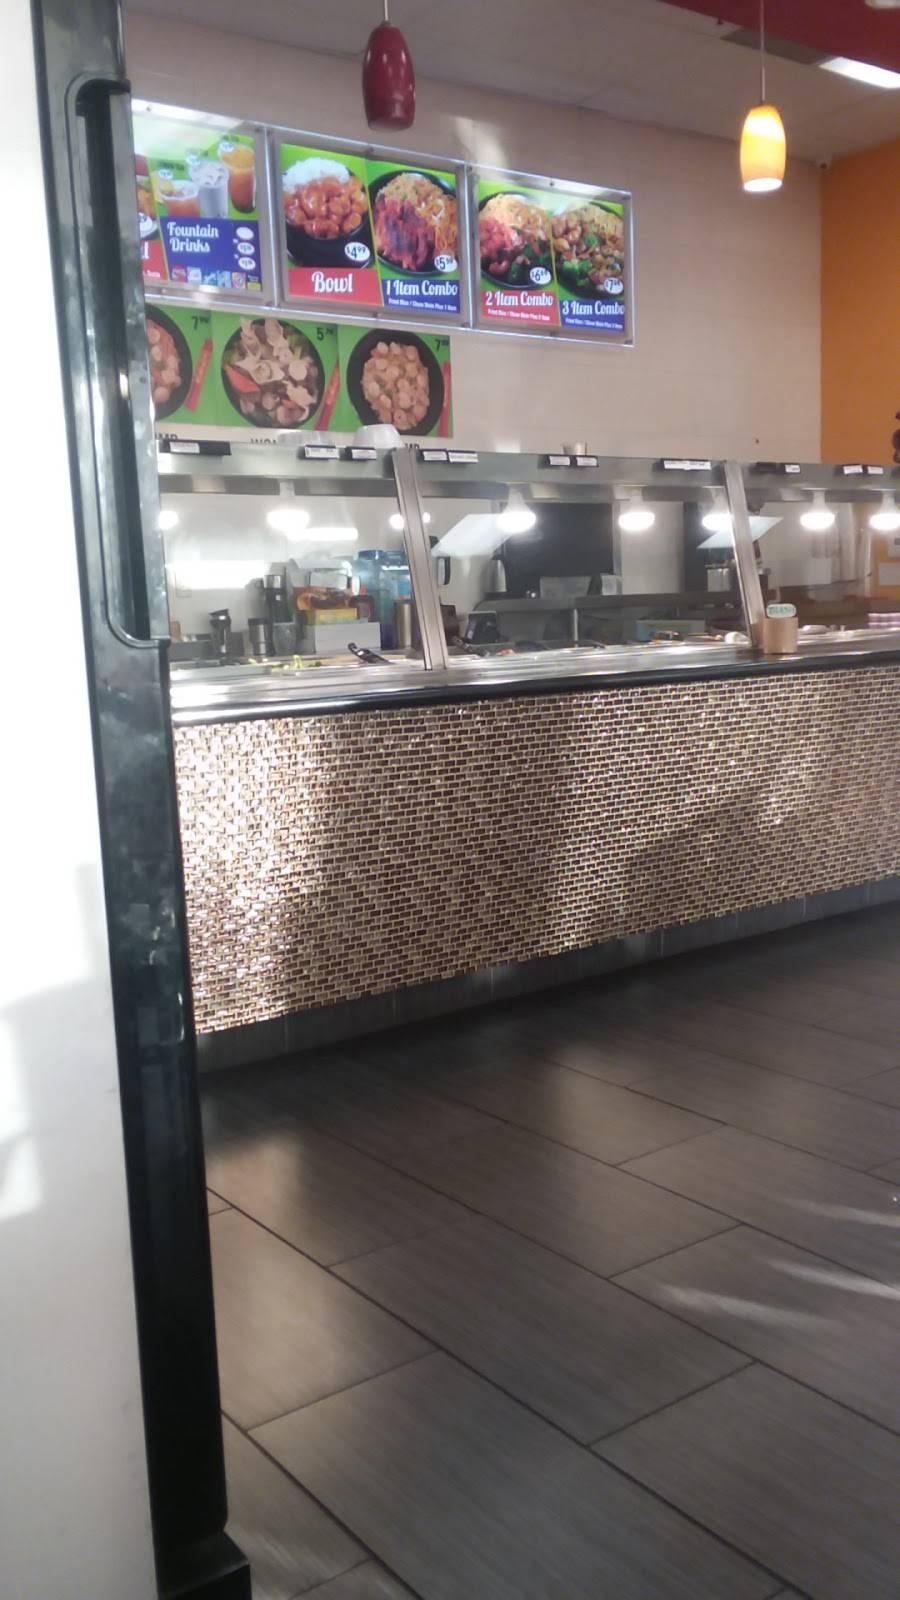 RiceWok | restaurant | 1014 N Hacienda Blvd, La Puente, CA 91744, USA | 6263307765 OR +1 626-330-7765